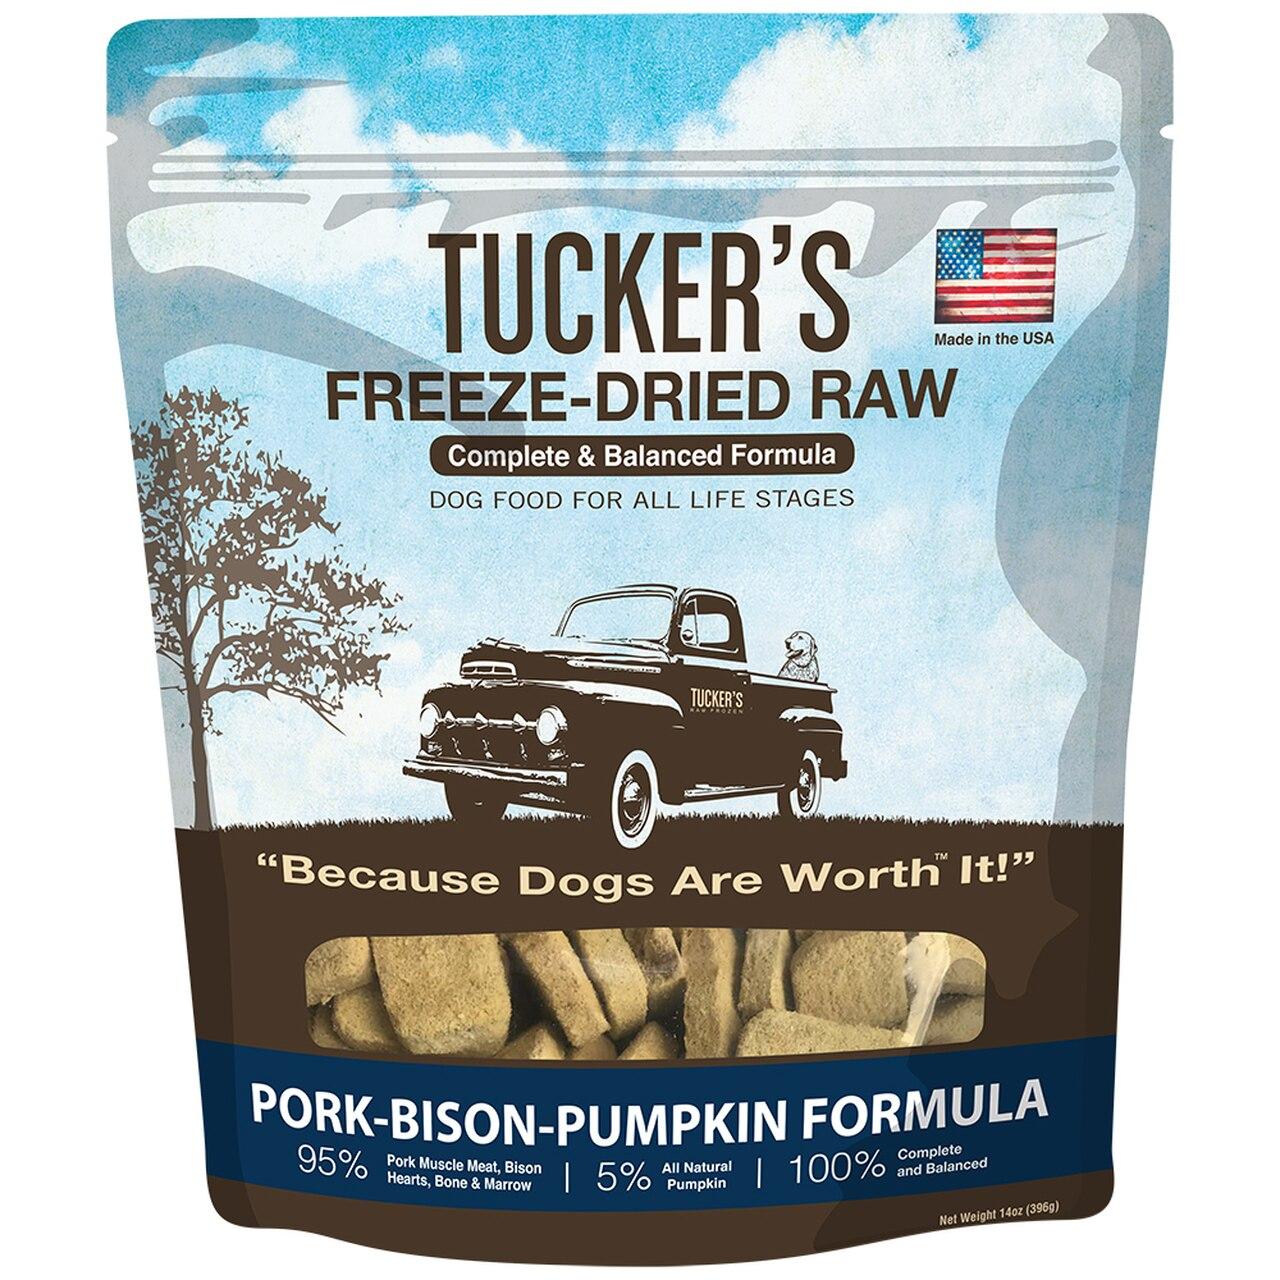 Tucker's Pork-Bison-Pumpkin Formula Freeze-Dried Raw Dog Food, 14-oz